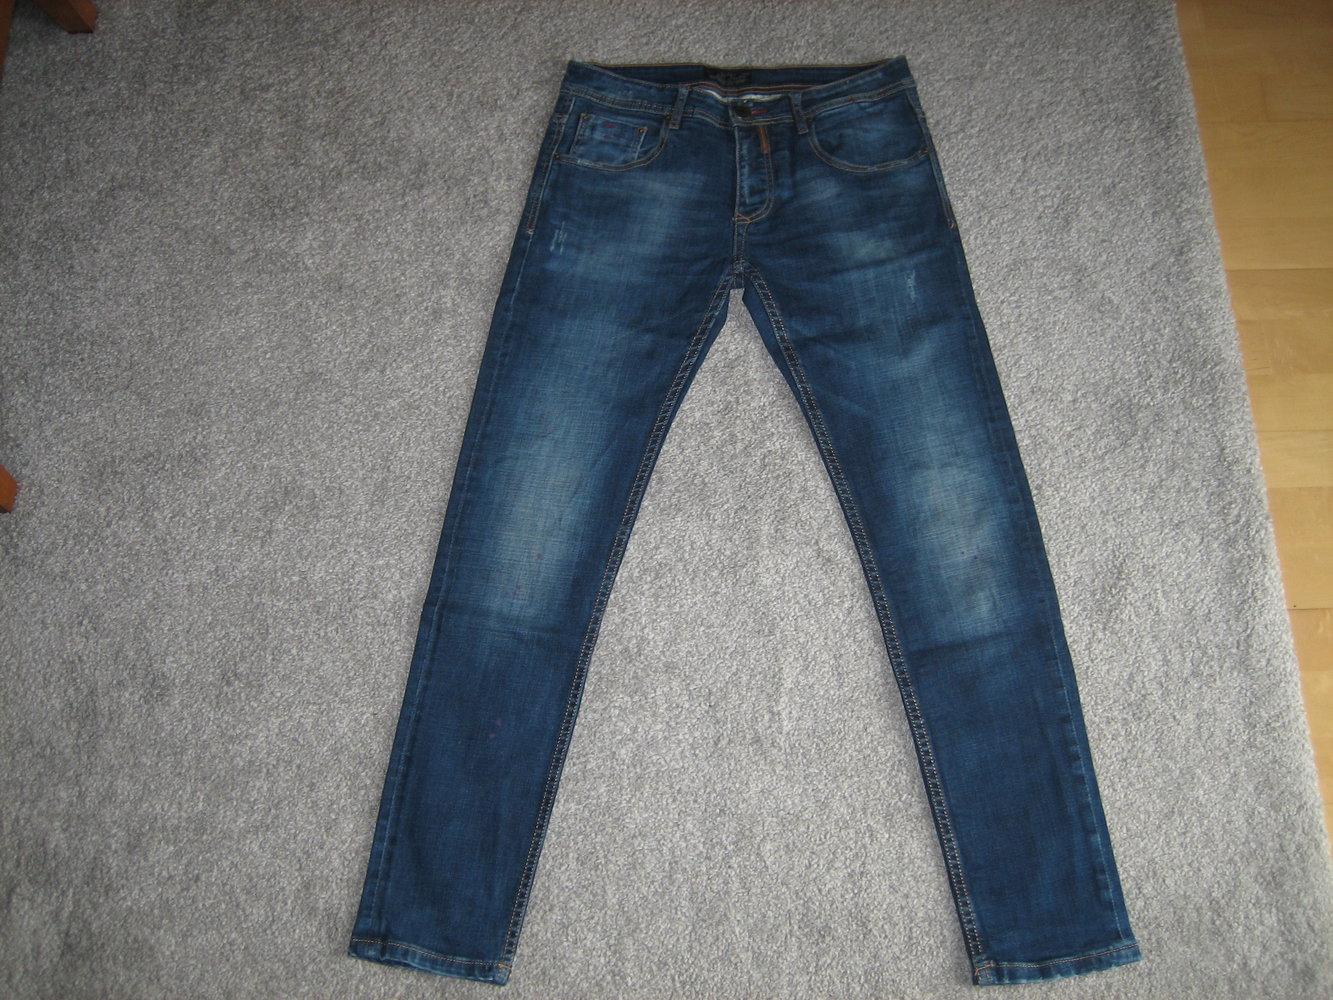 5b6e17abc70e schmale Form Superlässige, neuwertige Jeans Gr. 48 (s. Bemaßung!), schmale  Form .